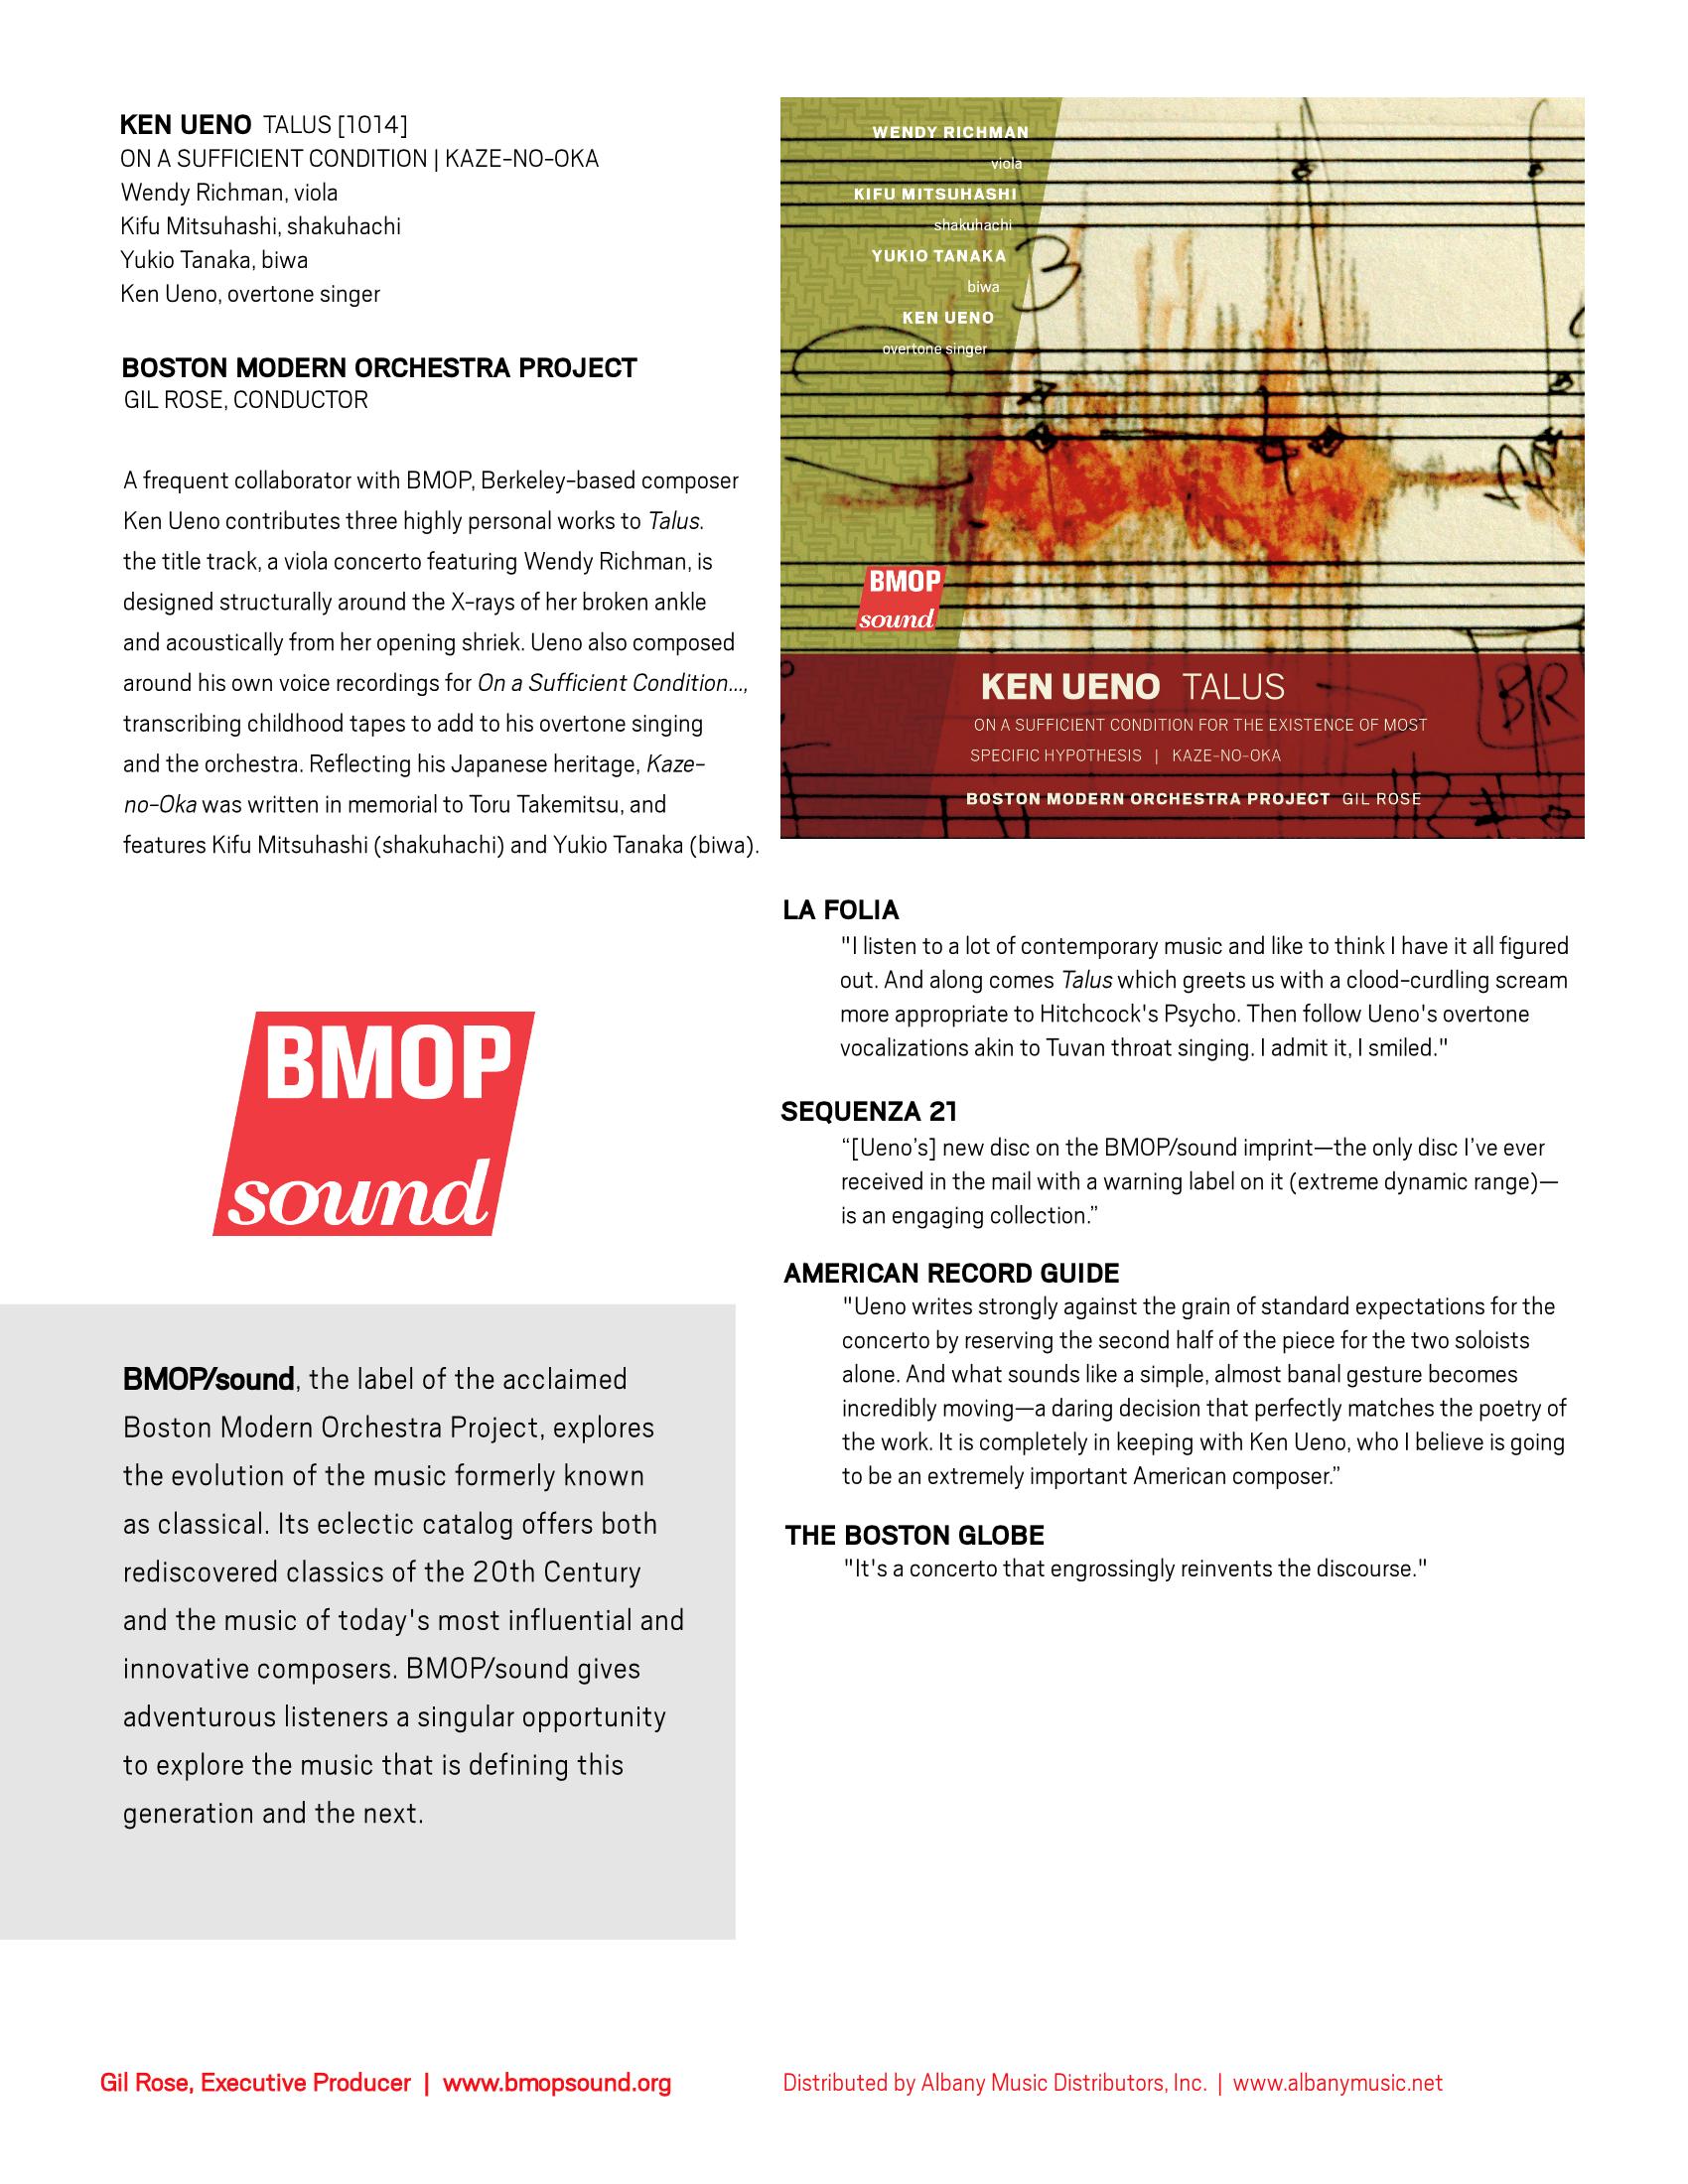 Ueno - BMOPsound 1014 one-sheet.png